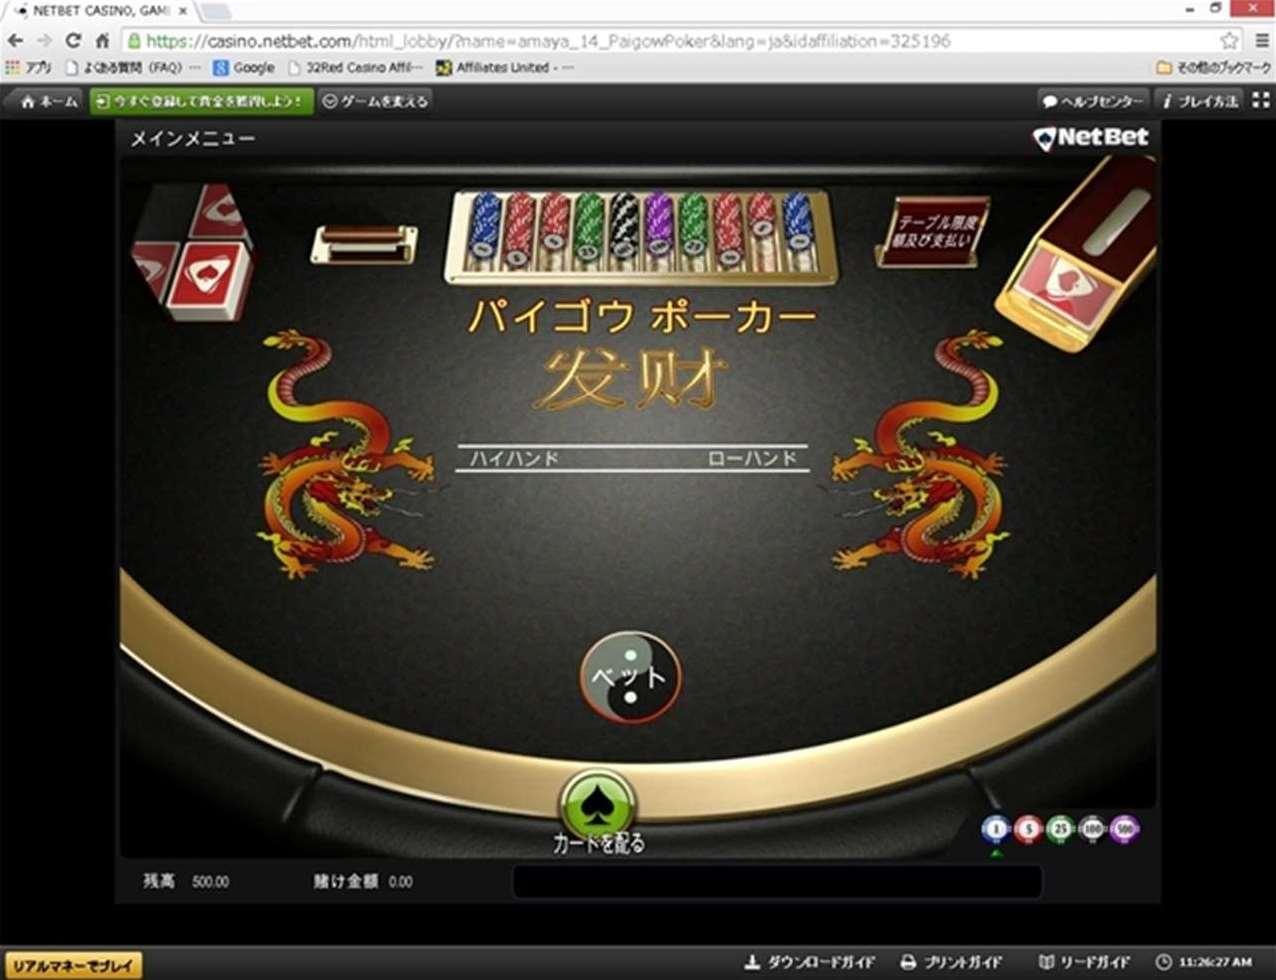 Net Bet Paigow Poker2